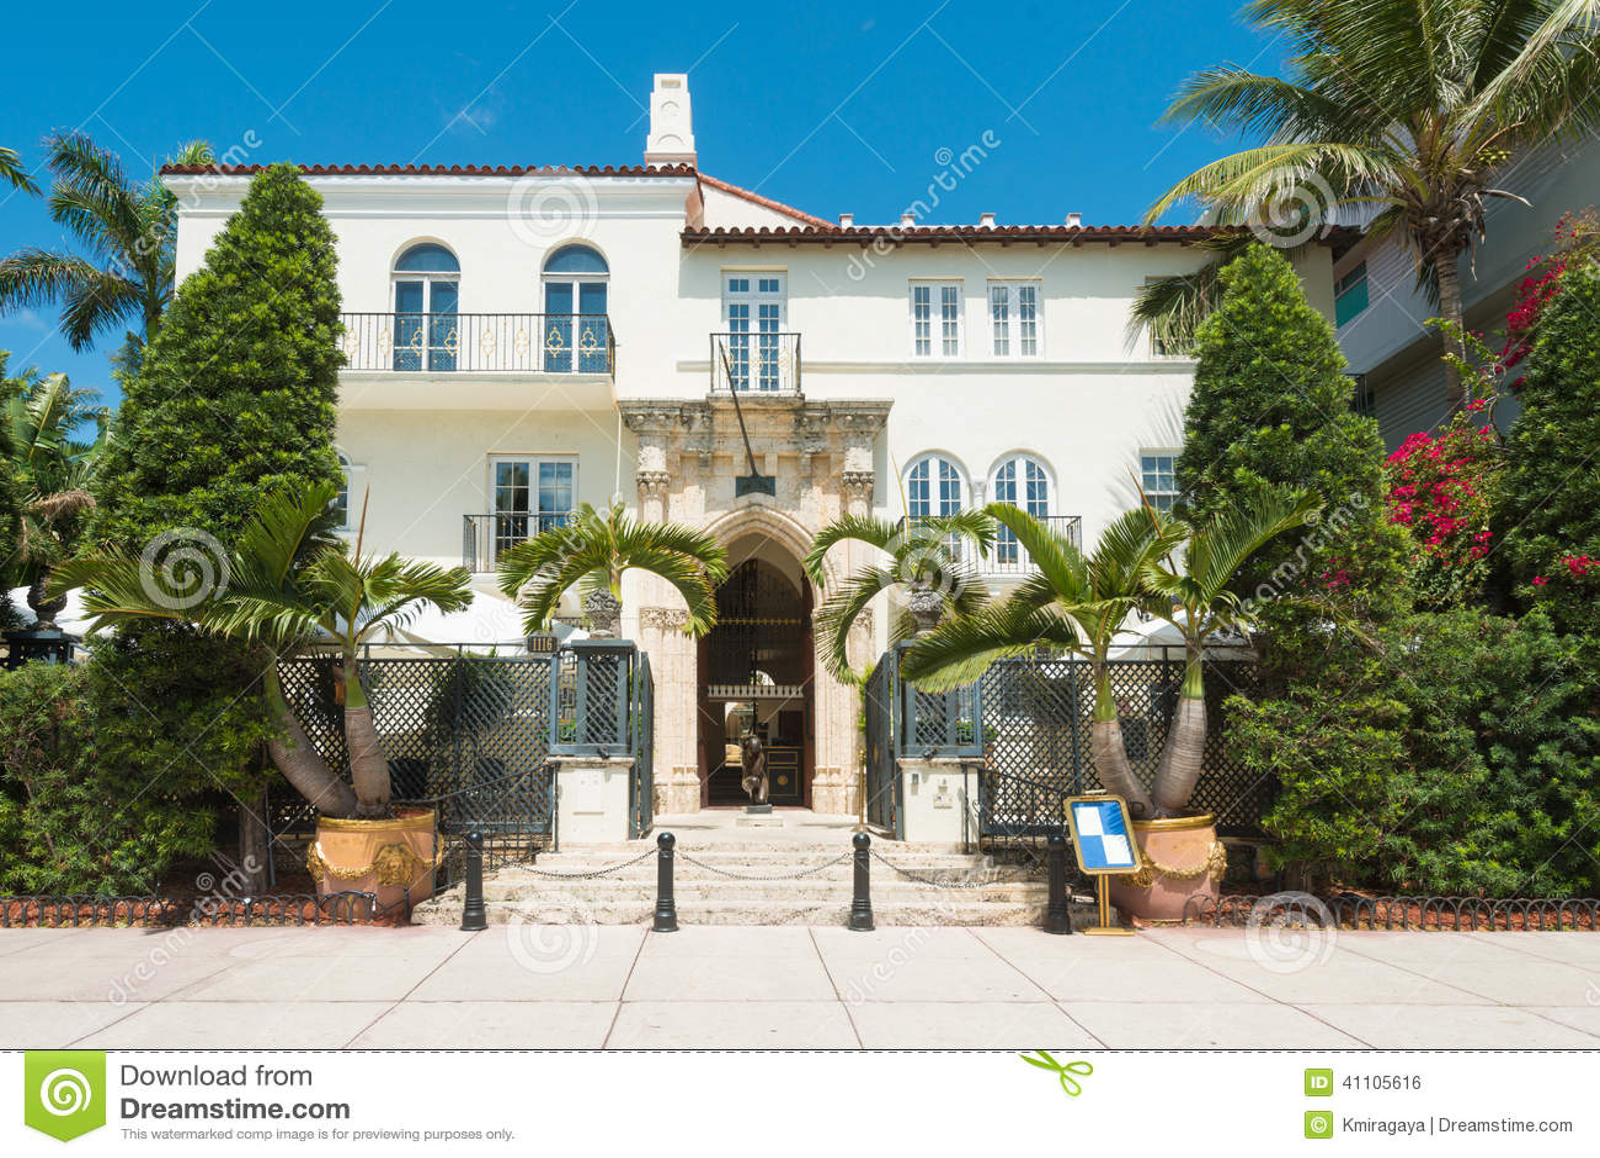 Versace Miami Beach Mansion